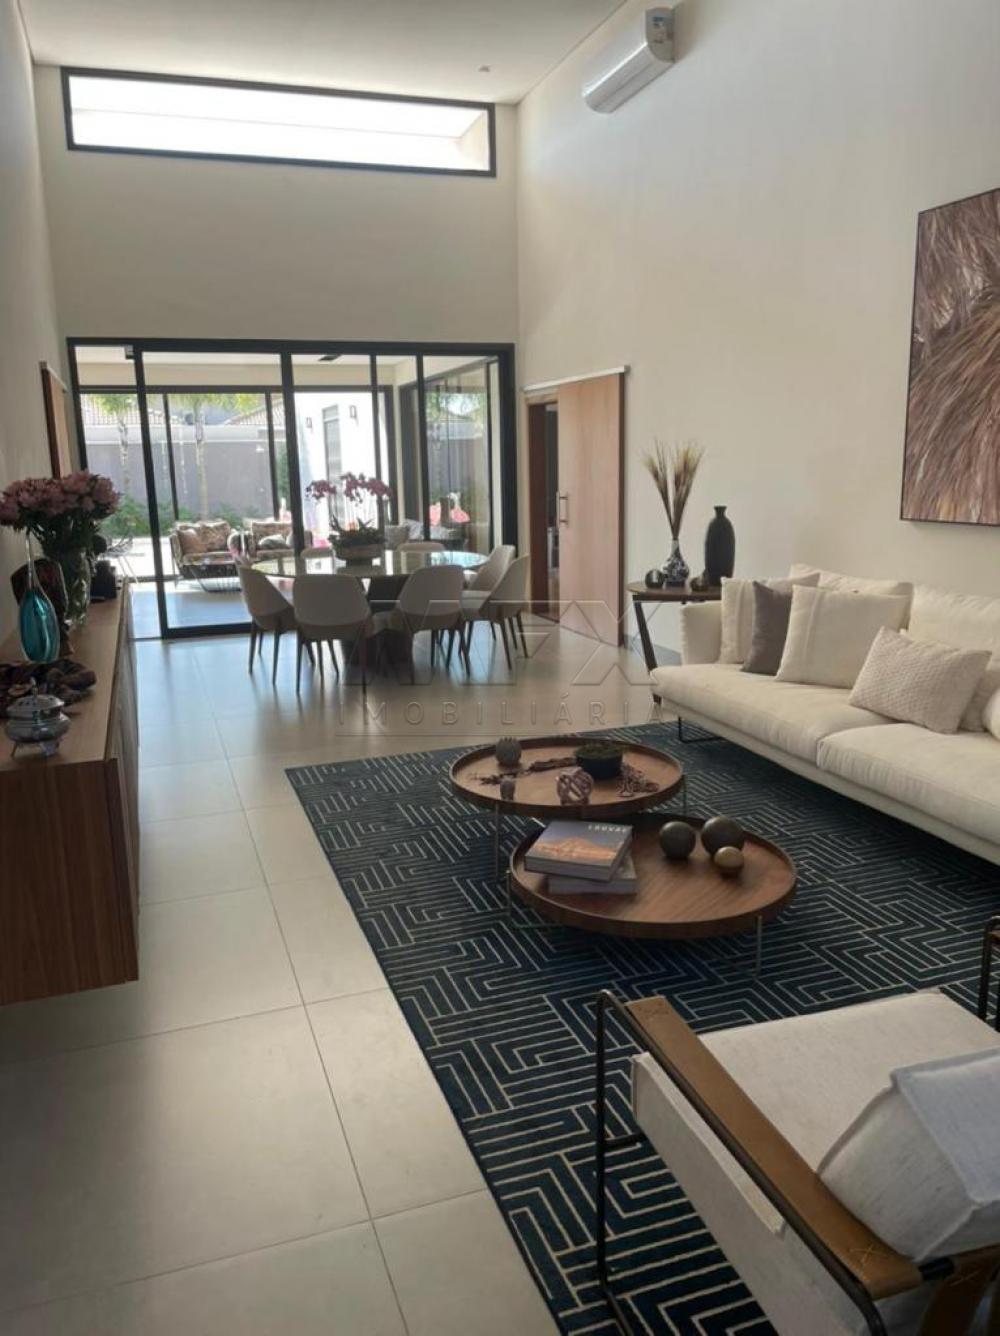 Comprar Casa / Condomínio em Bauru R$ 2.400.000,00 - Foto 4